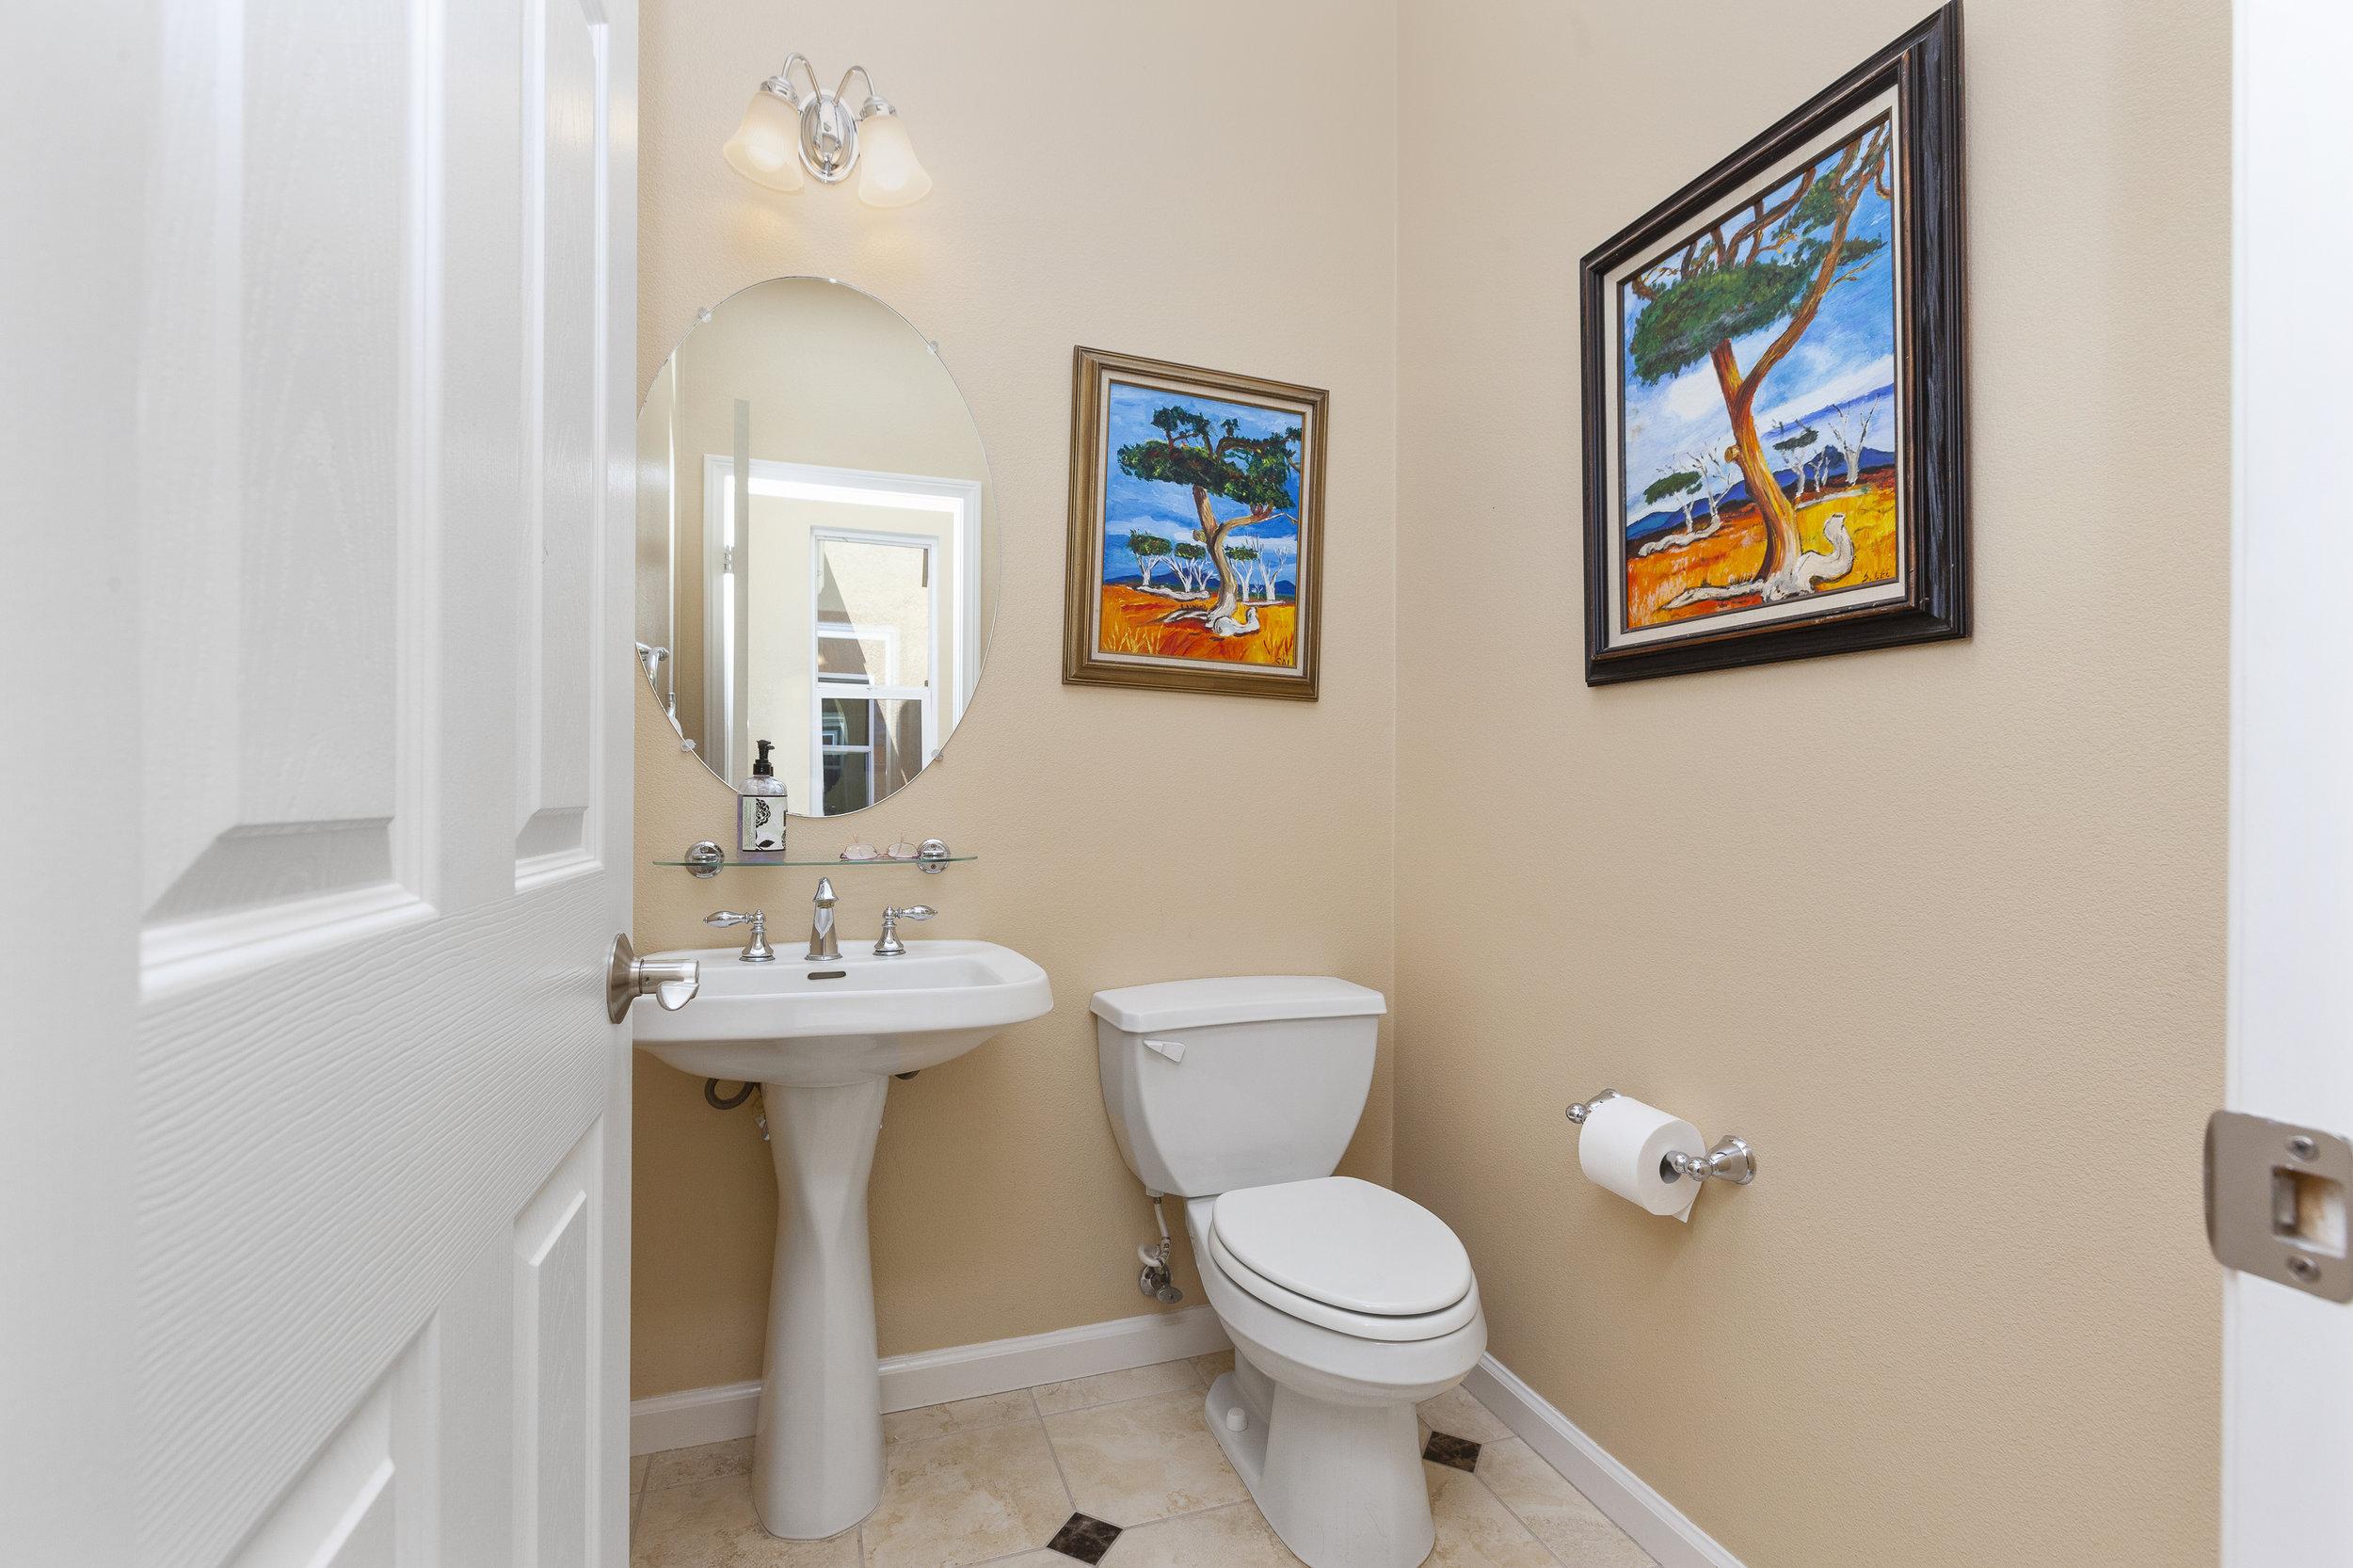 014_Bathroom .jpg